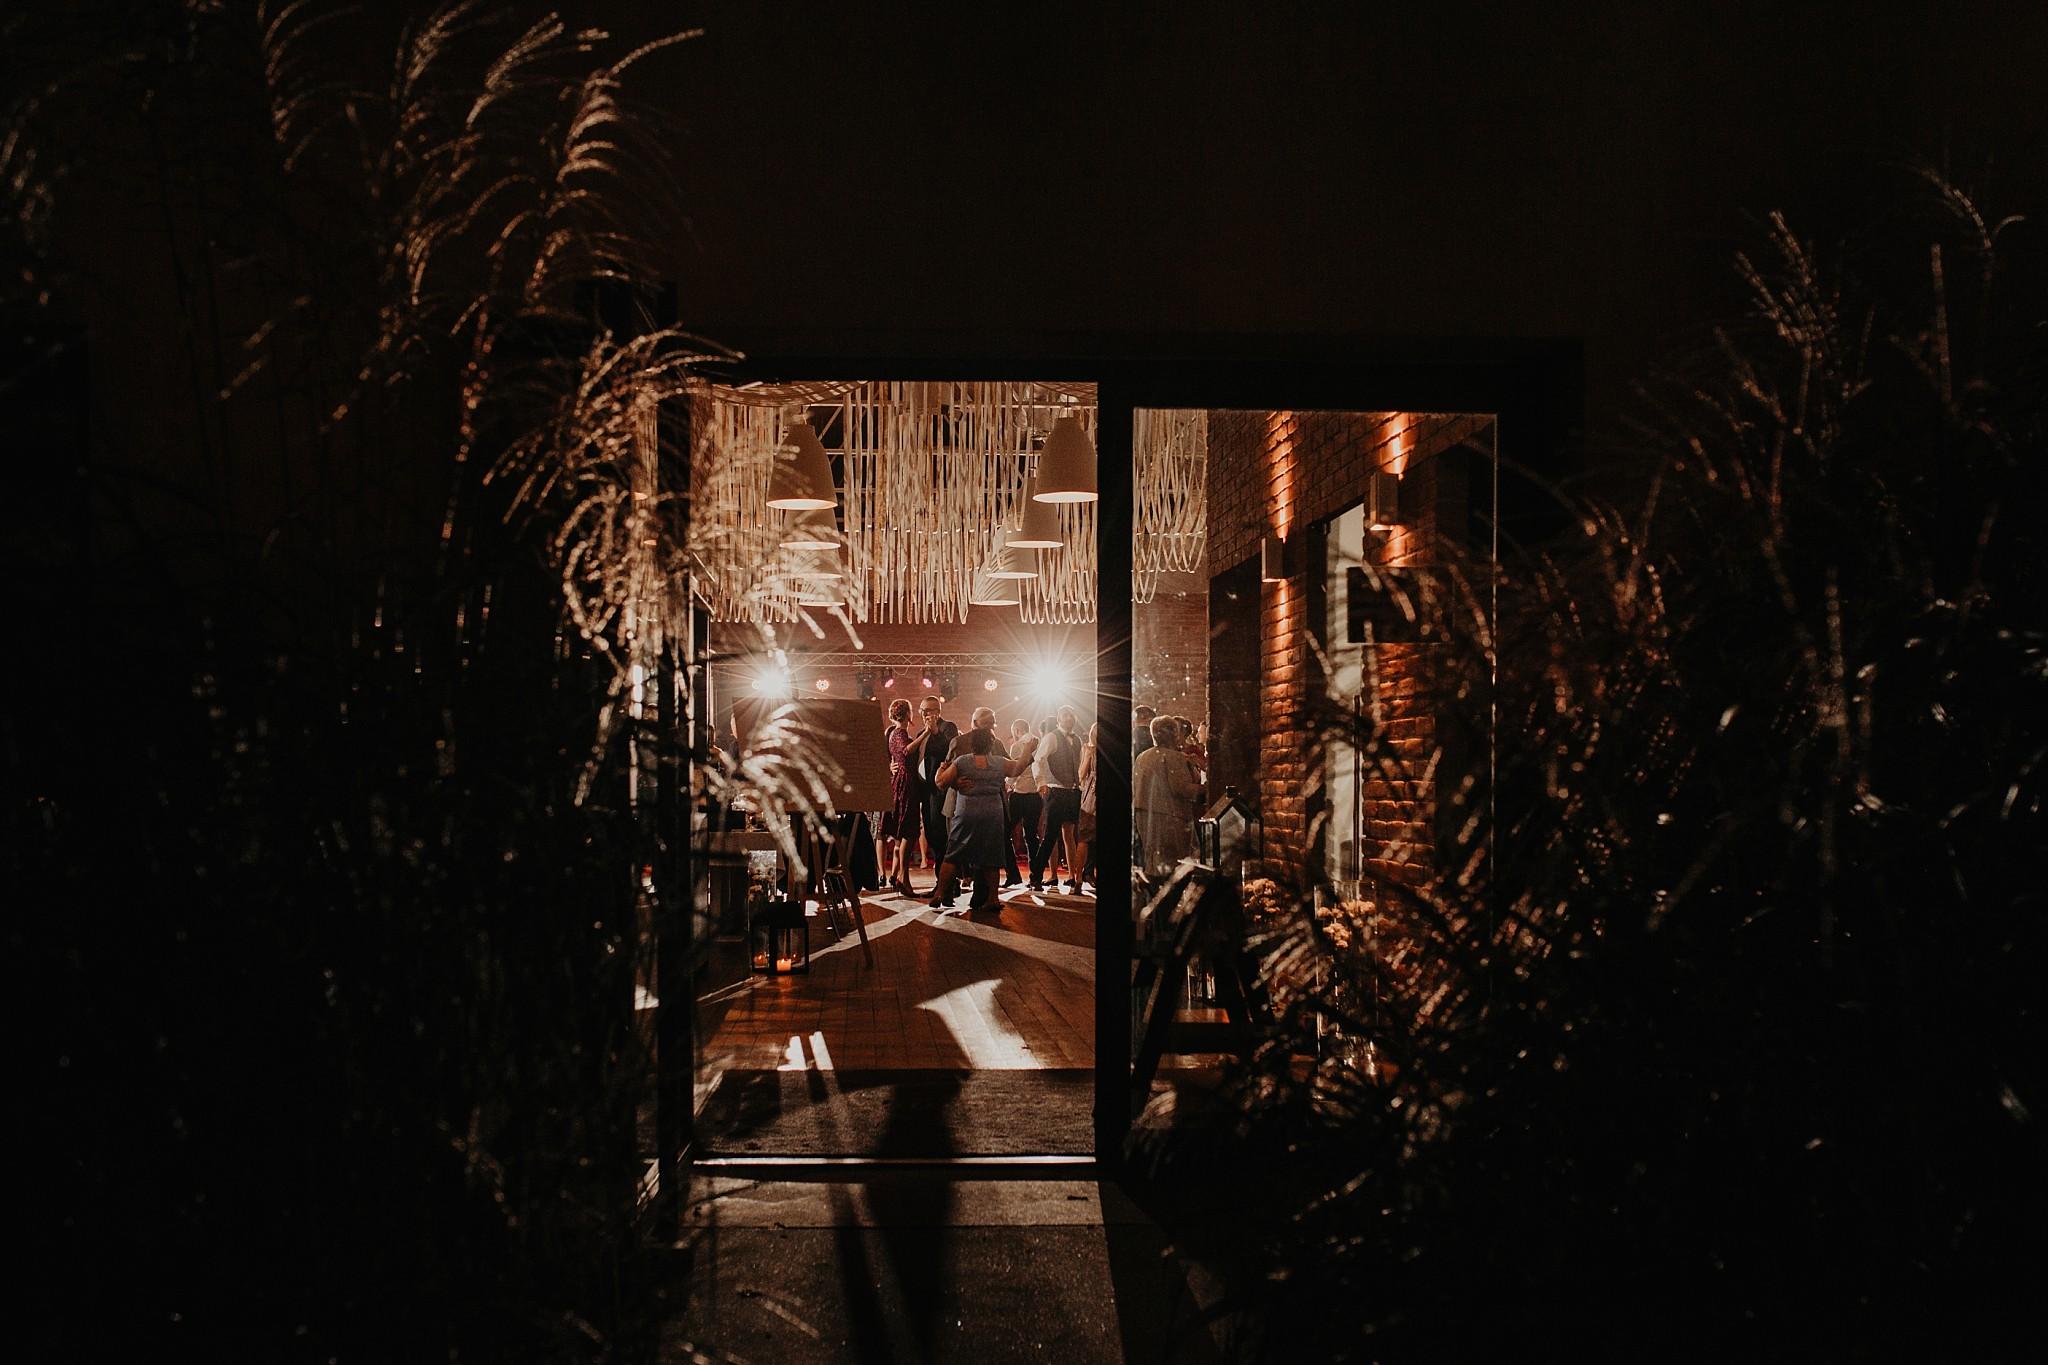 fotograf poznan wesele dobra truskawka piekne wesele pod poznaniem wesele w dobrej truskawce piekna para mloda slub marzen slub koronawirus slub listopad wesele koronawirus 421